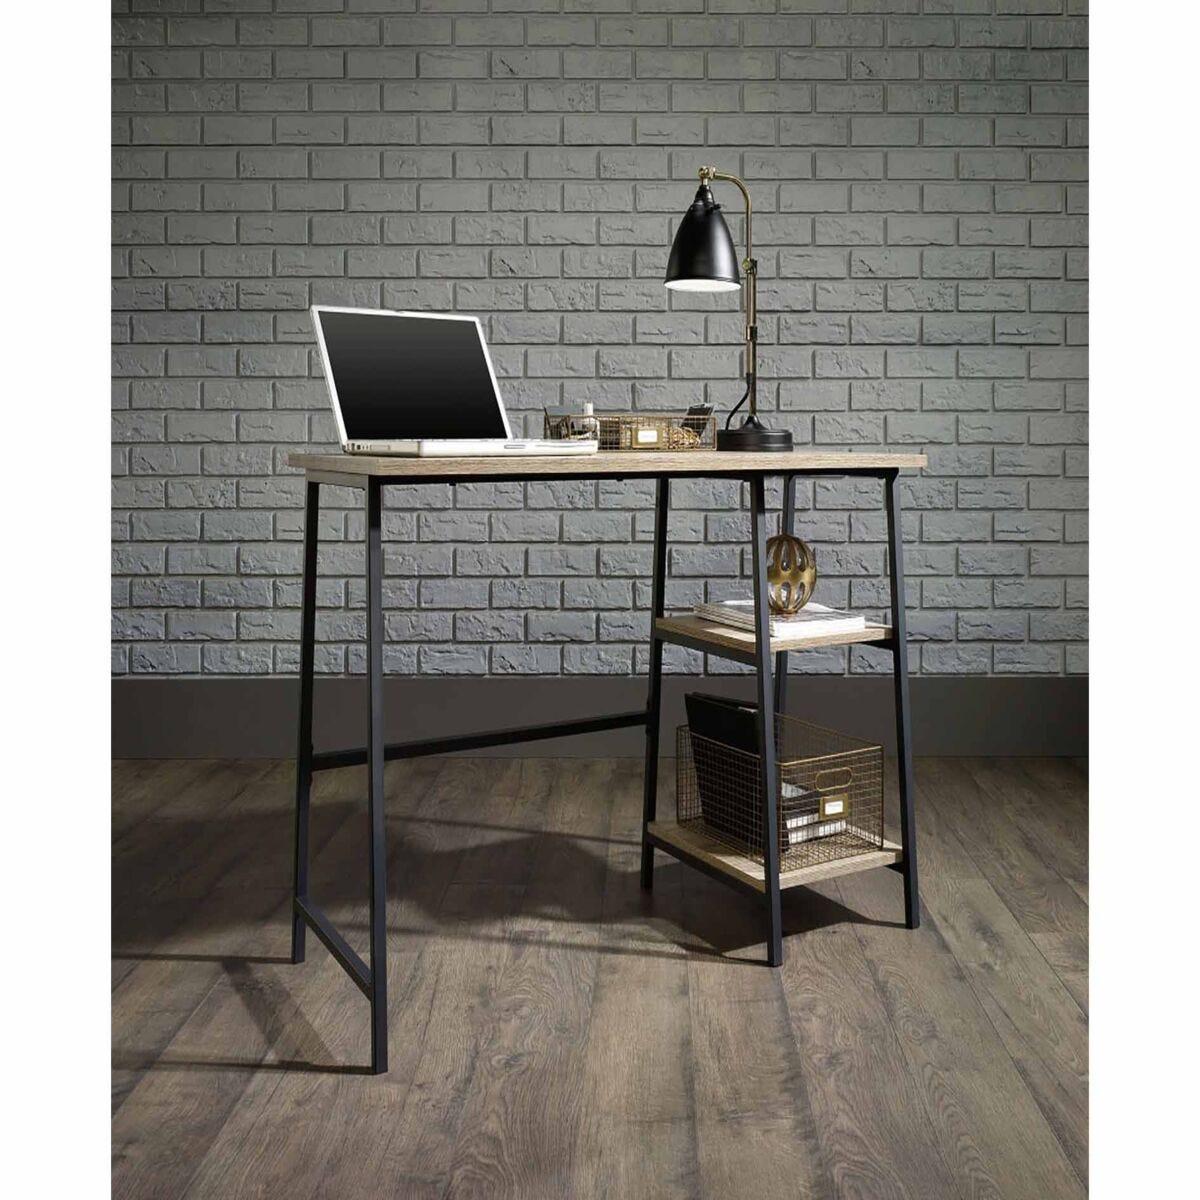 Teknik Office Industrial Bench Desk